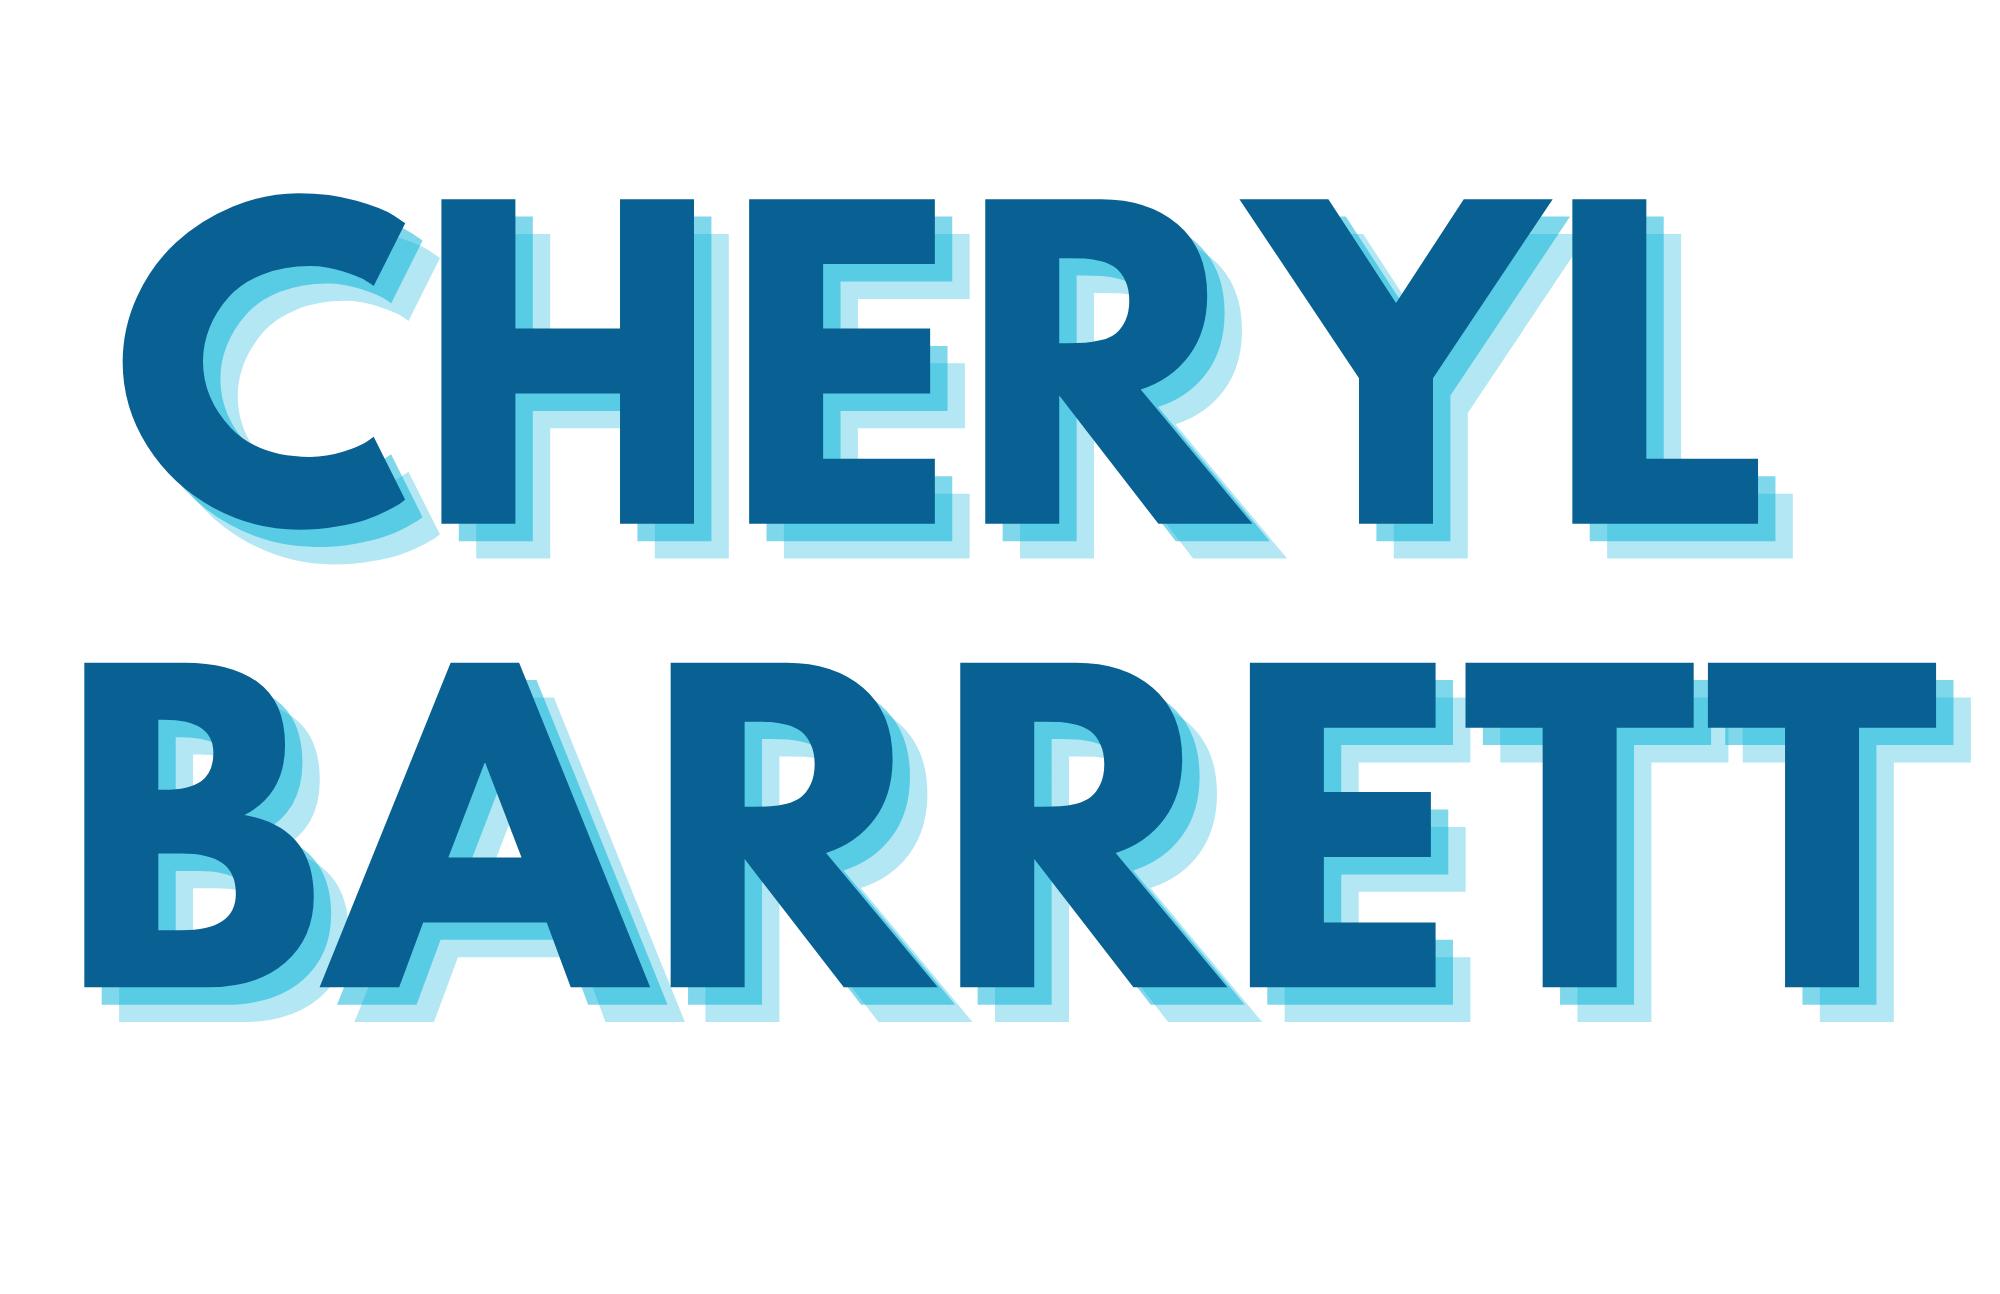 The President's Cup - Cheryl Barrett - Logo